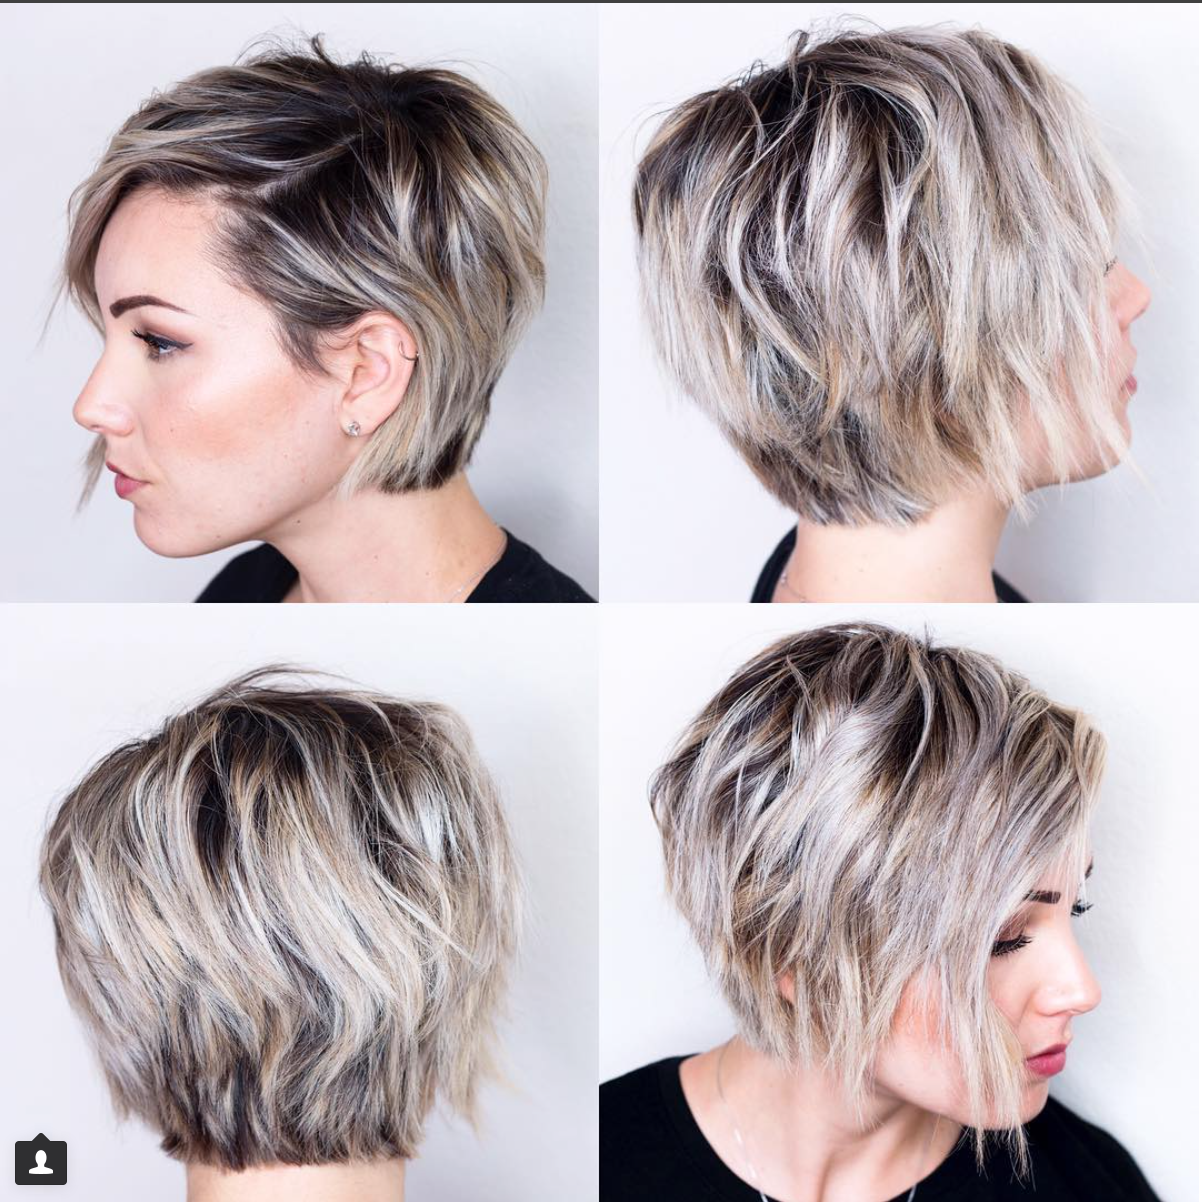 Communication on this topic: 10 Amazing Short Hairstyles for Free-Spirited Women, 10-amazing-short-hairstyles-for-free-spirited-women/